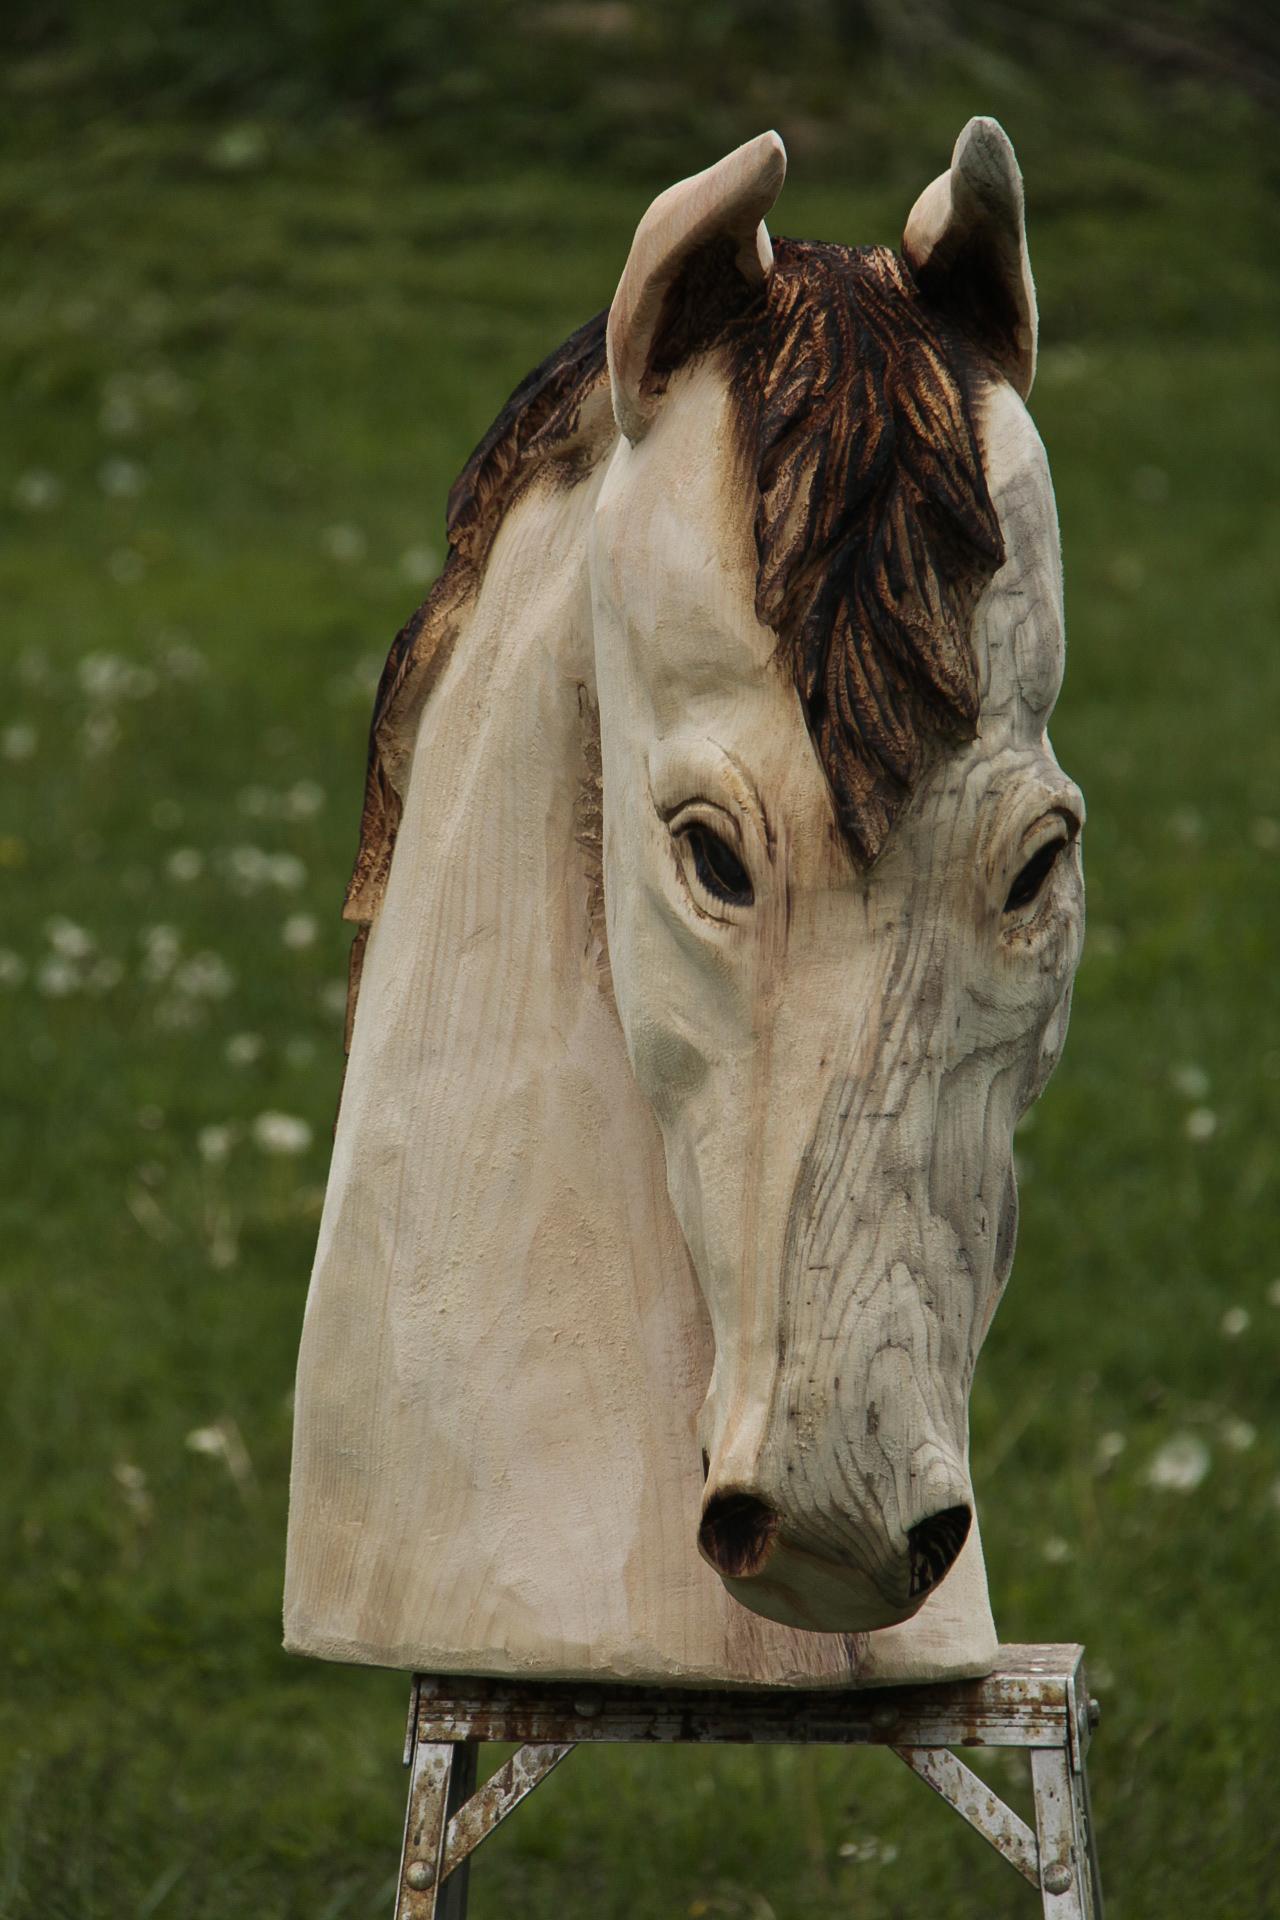 Horse head carving custom sculpture sign company